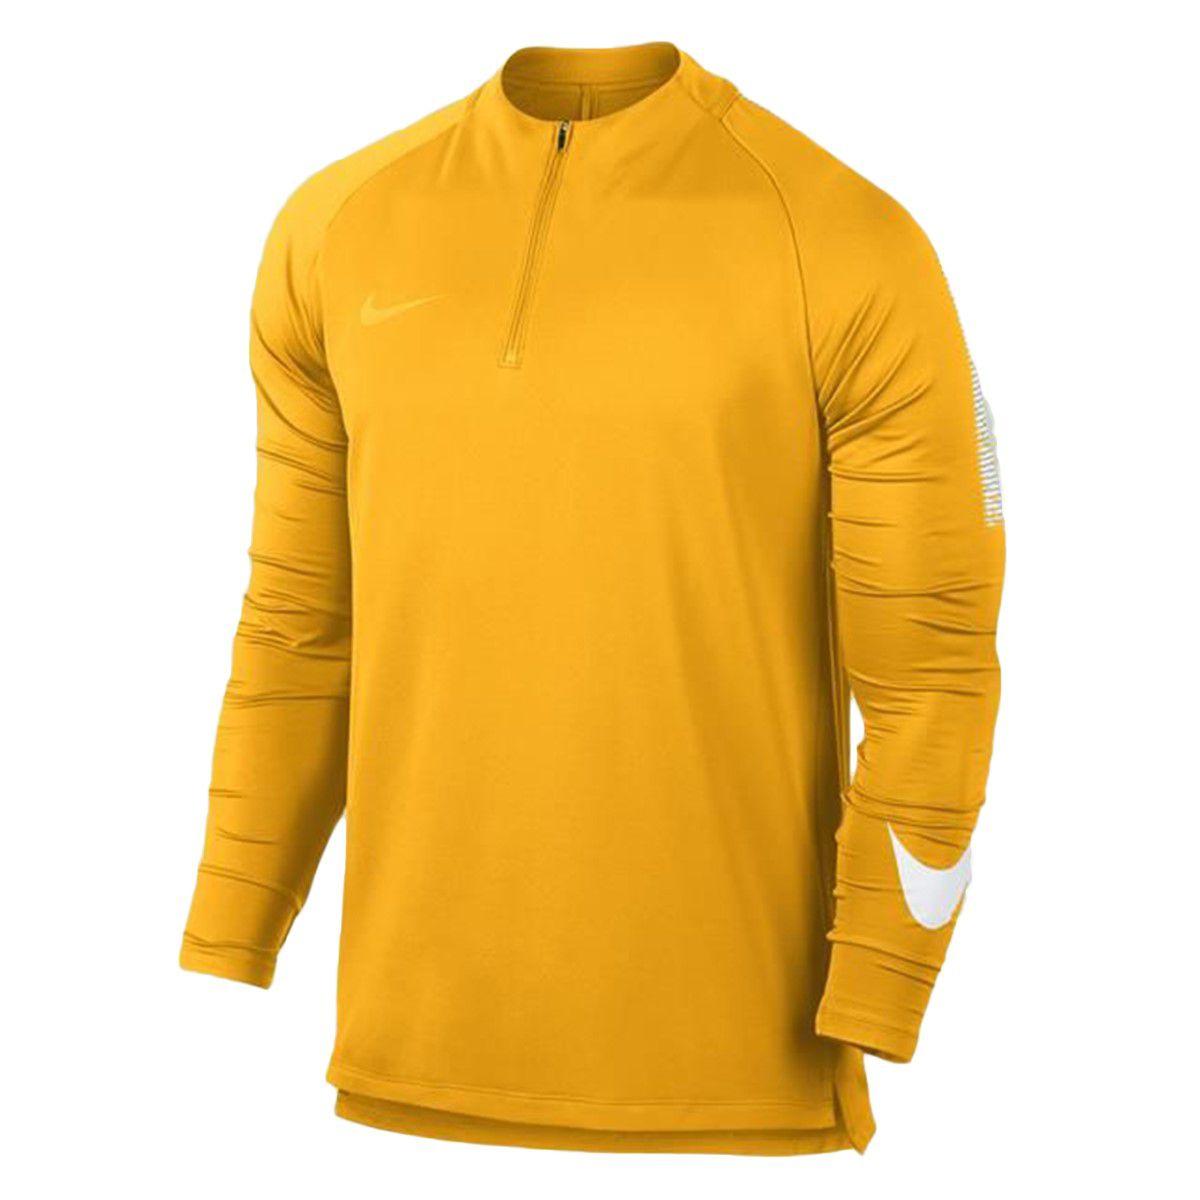 e1d381ec2 Nike Dry Squad Drill Uzun Kollu Erkek Tişört 859197845 - Sweatshirt ...